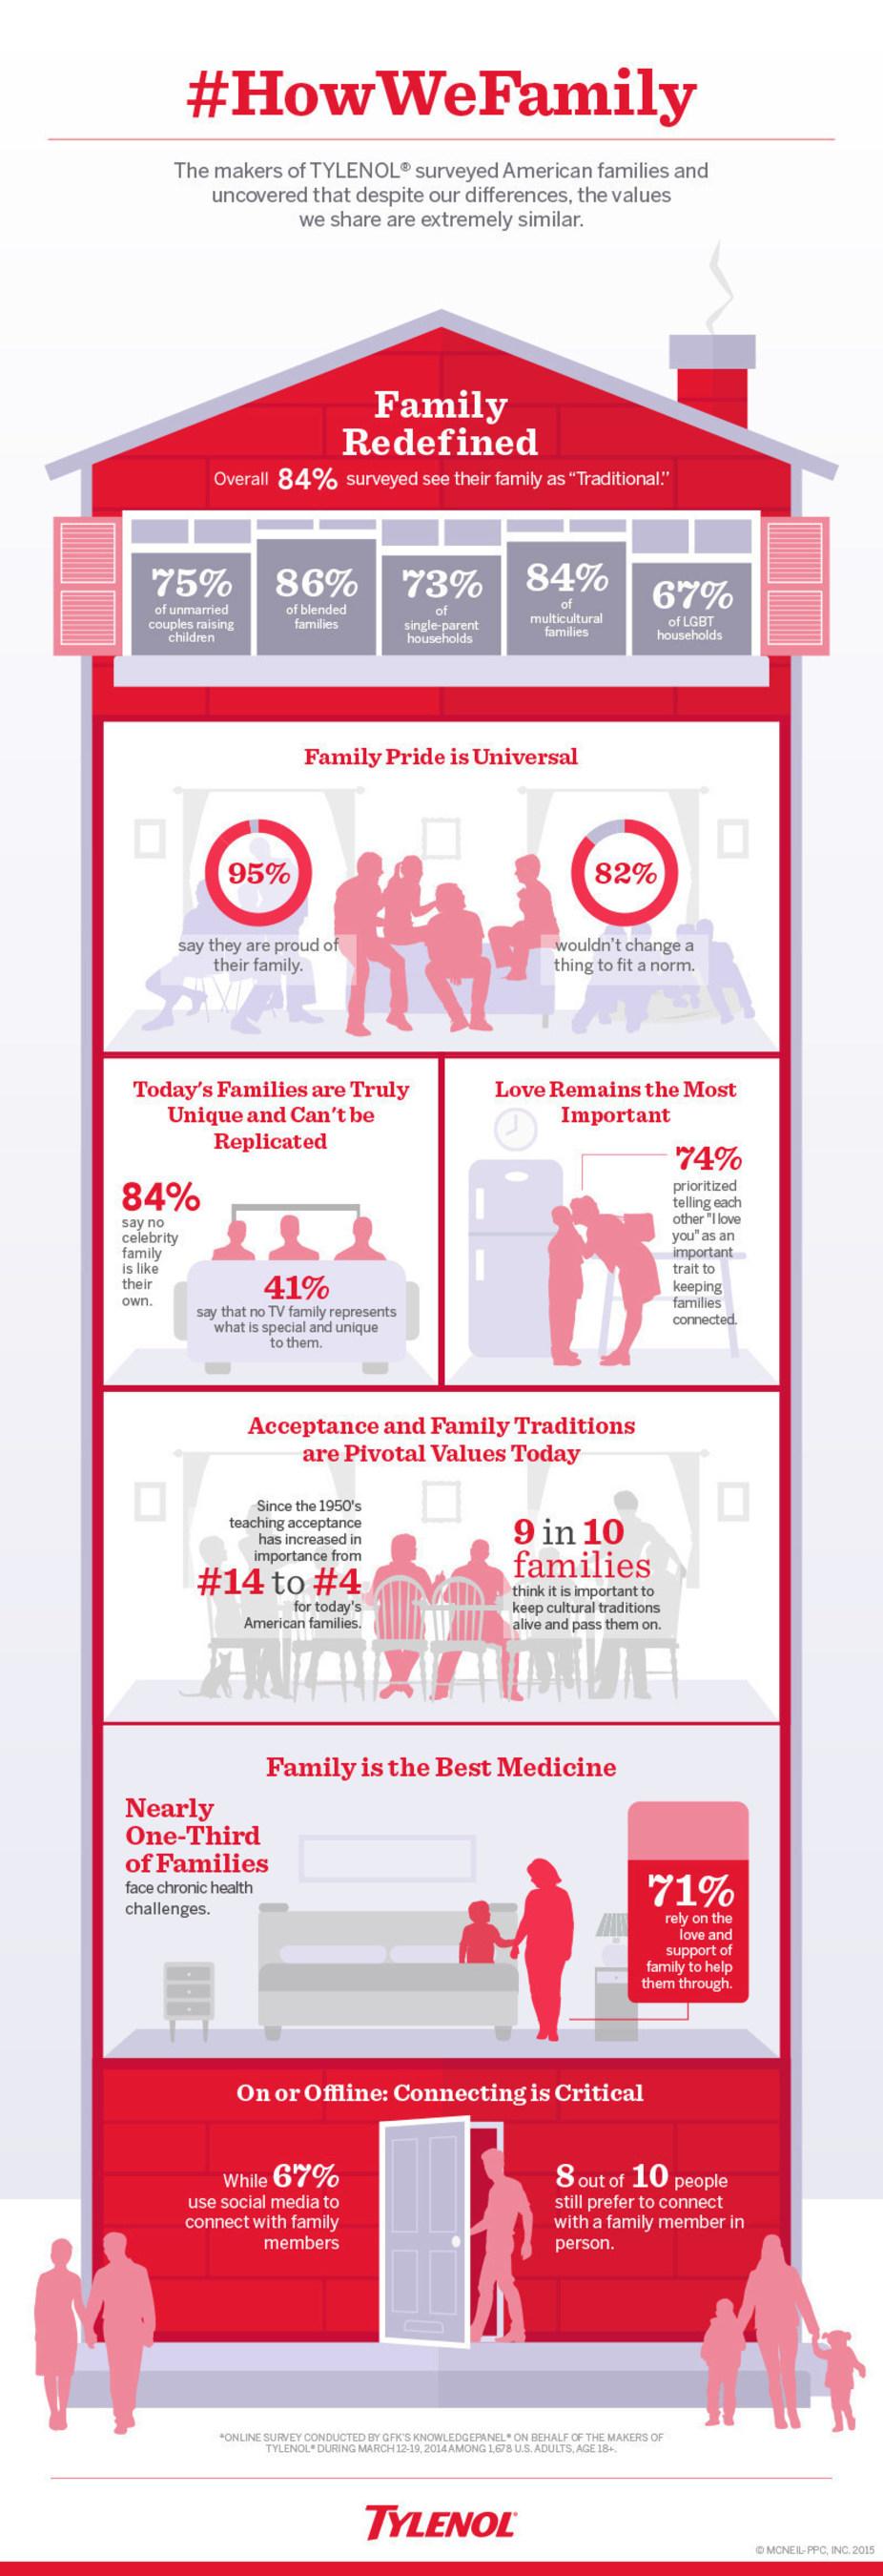 #HWF Infographic